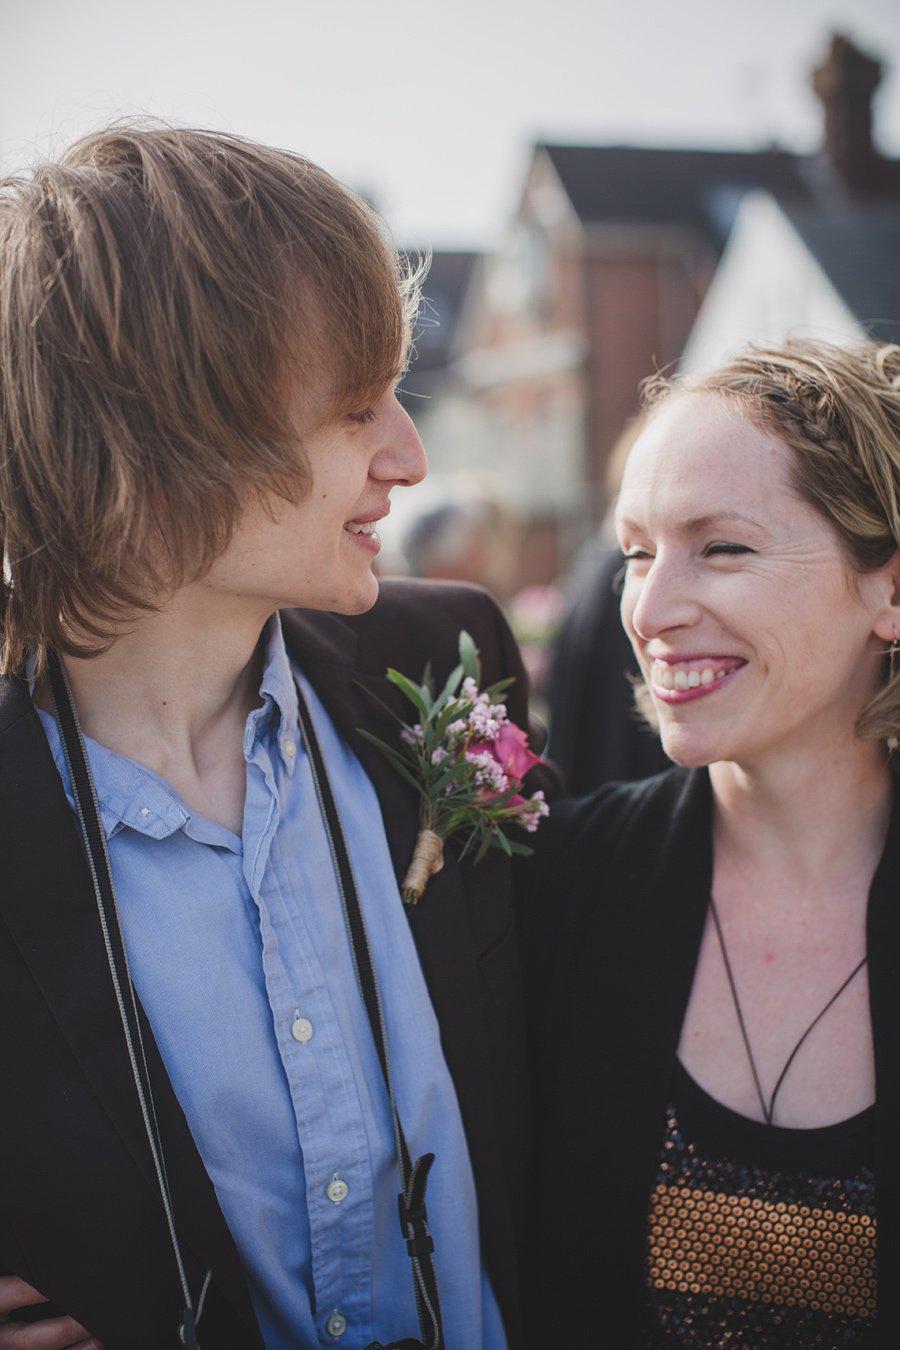 arundel-town-hall-wedding-sally-bill-049